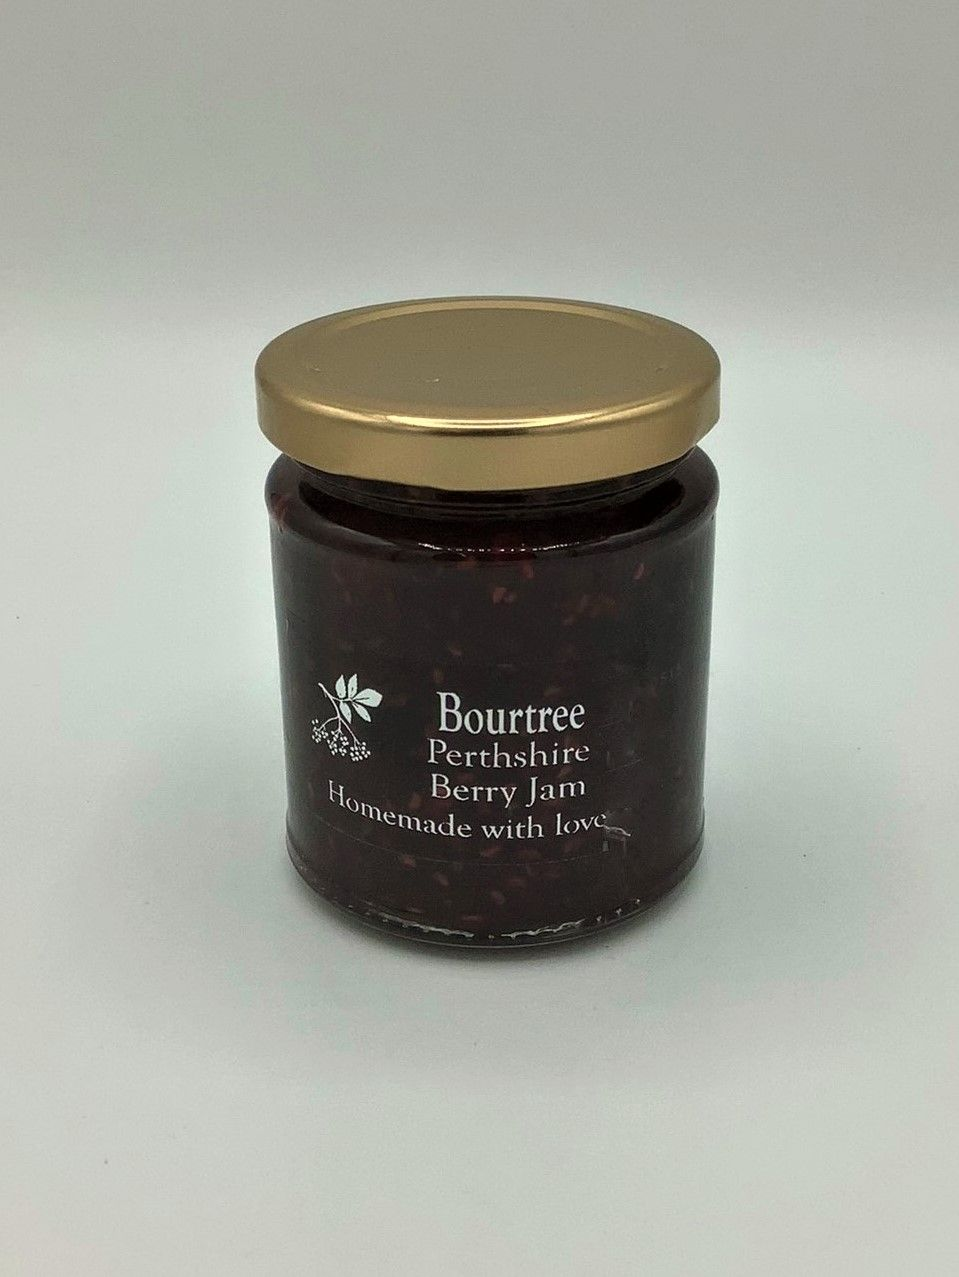 Bourtree Perthshire Berries Jam